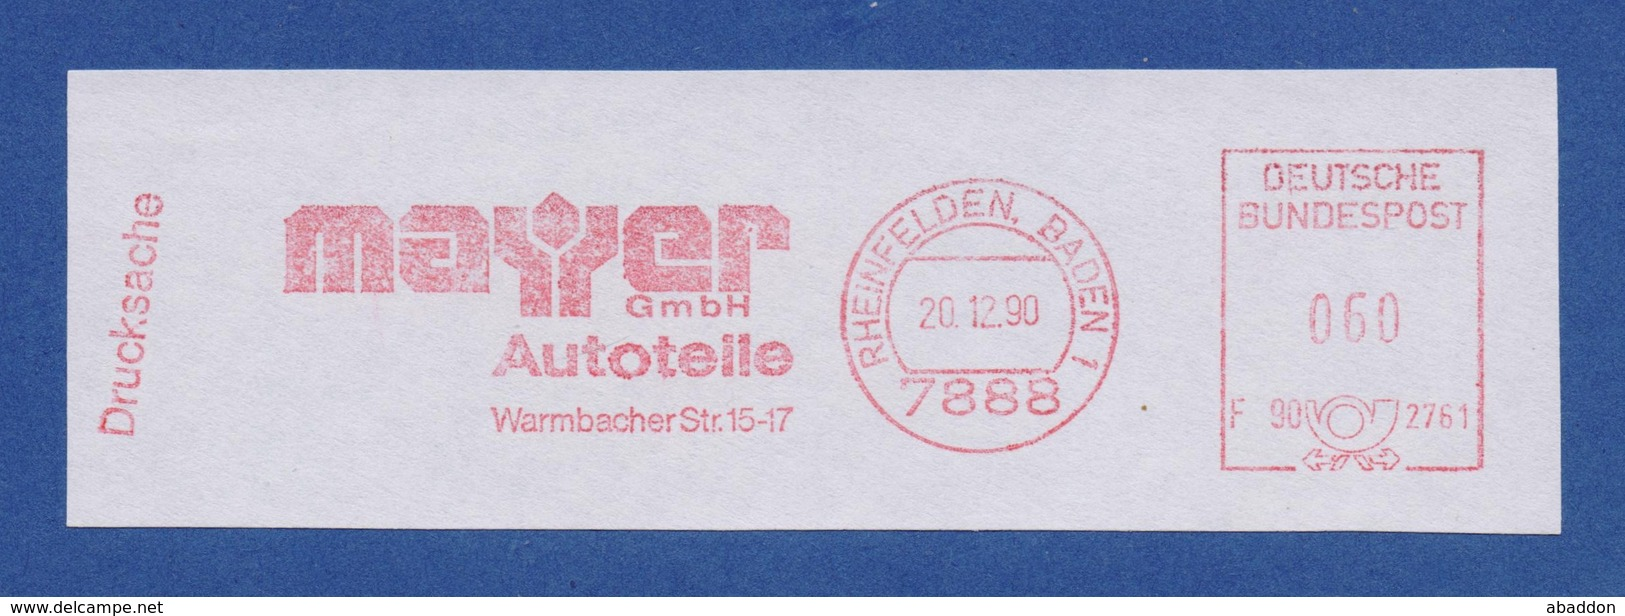 BRD ASF - RHEINFELDEN, Mayer GmbH - Autoteile 20.12.90 - Transports